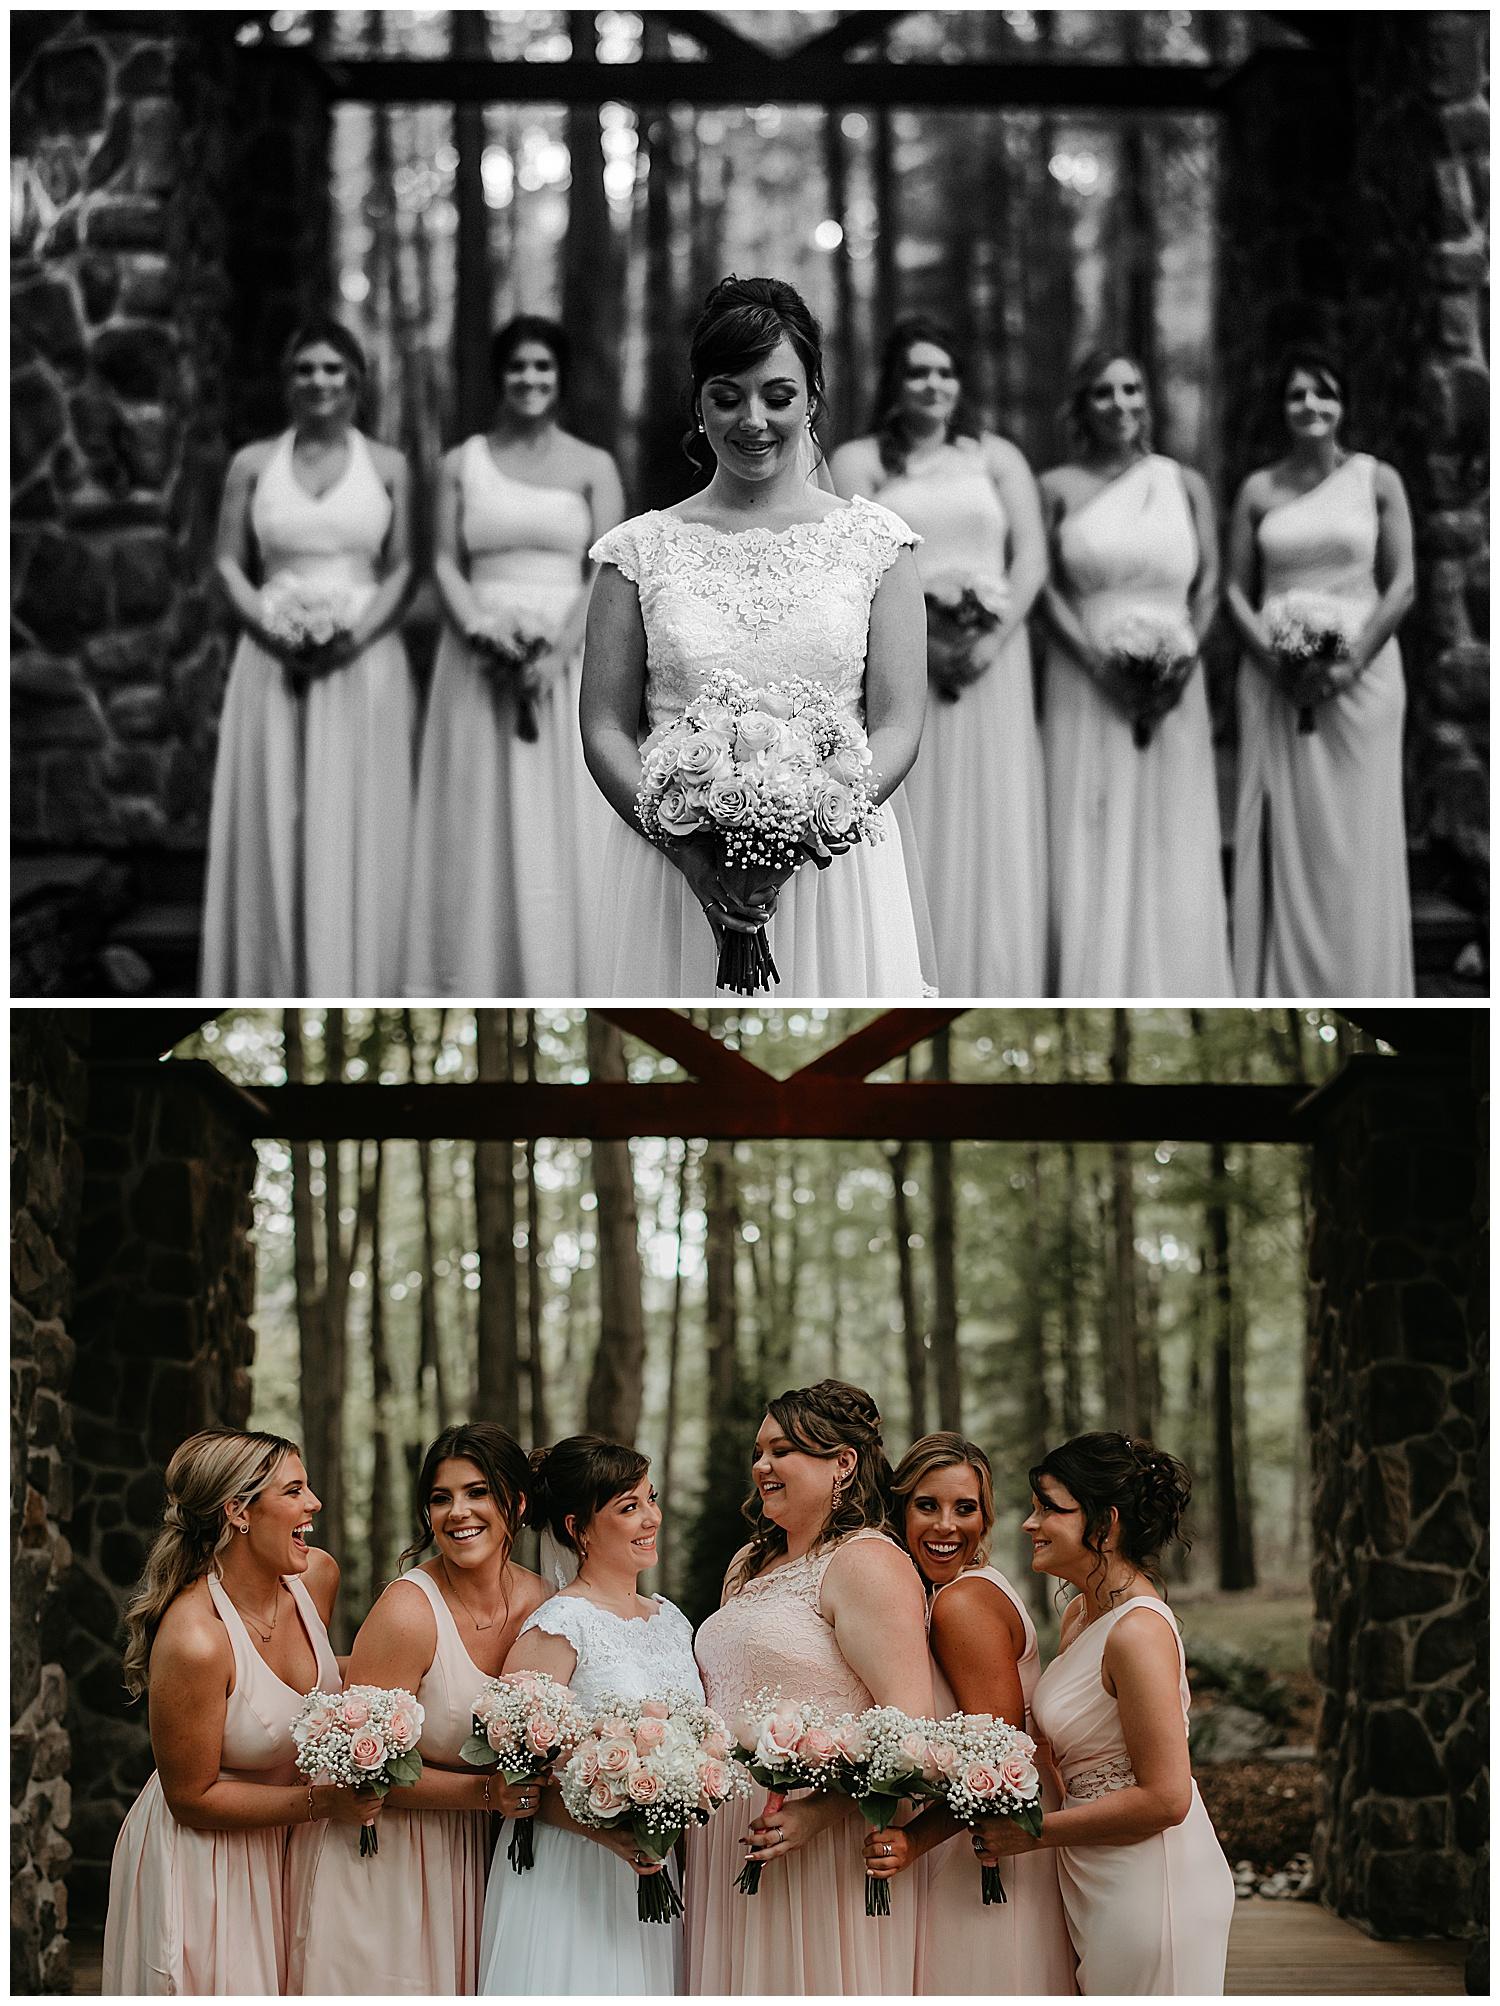 NEPA-Mount-Pocono-Wedding-Photographer-at-the-Stroudsmoor-Country-Inn-Stroudsburg-PA_0036.jpg